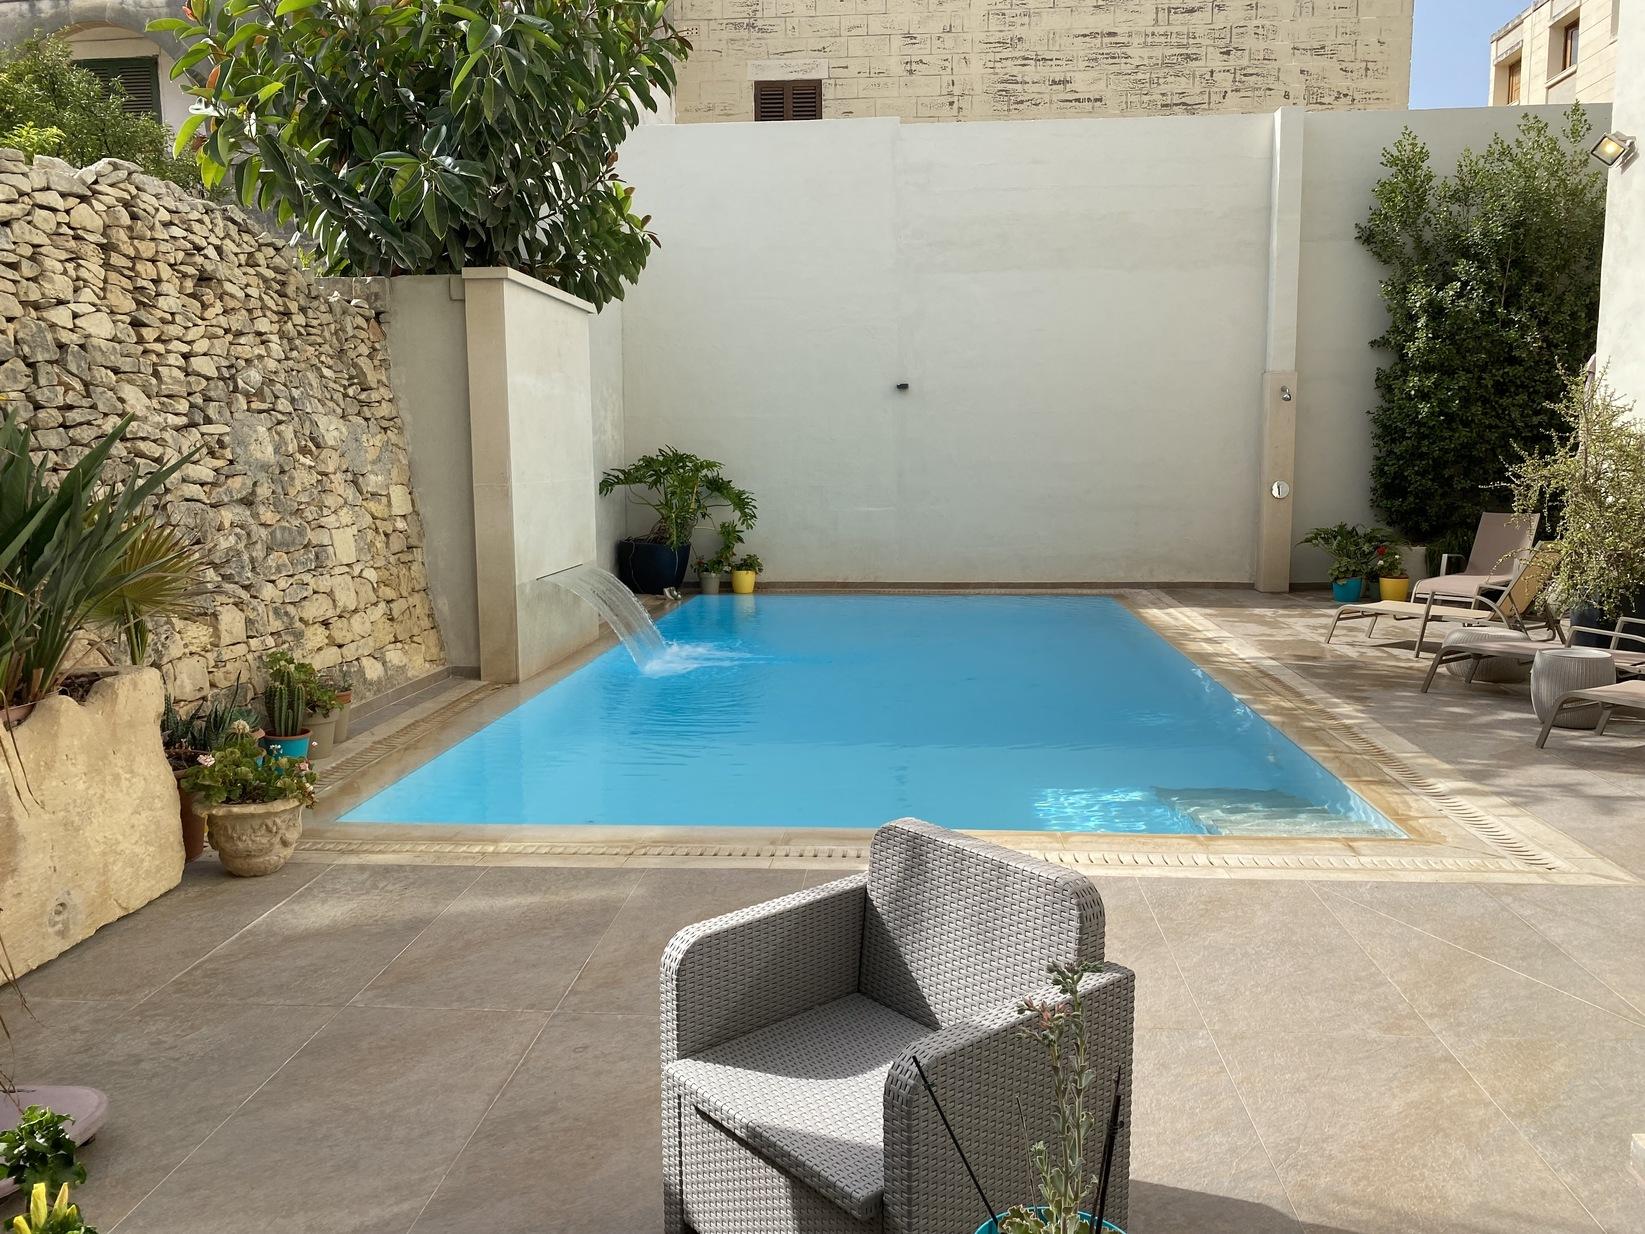 3 bed Town House For Sale in Balzan, Balzan - thumb 15